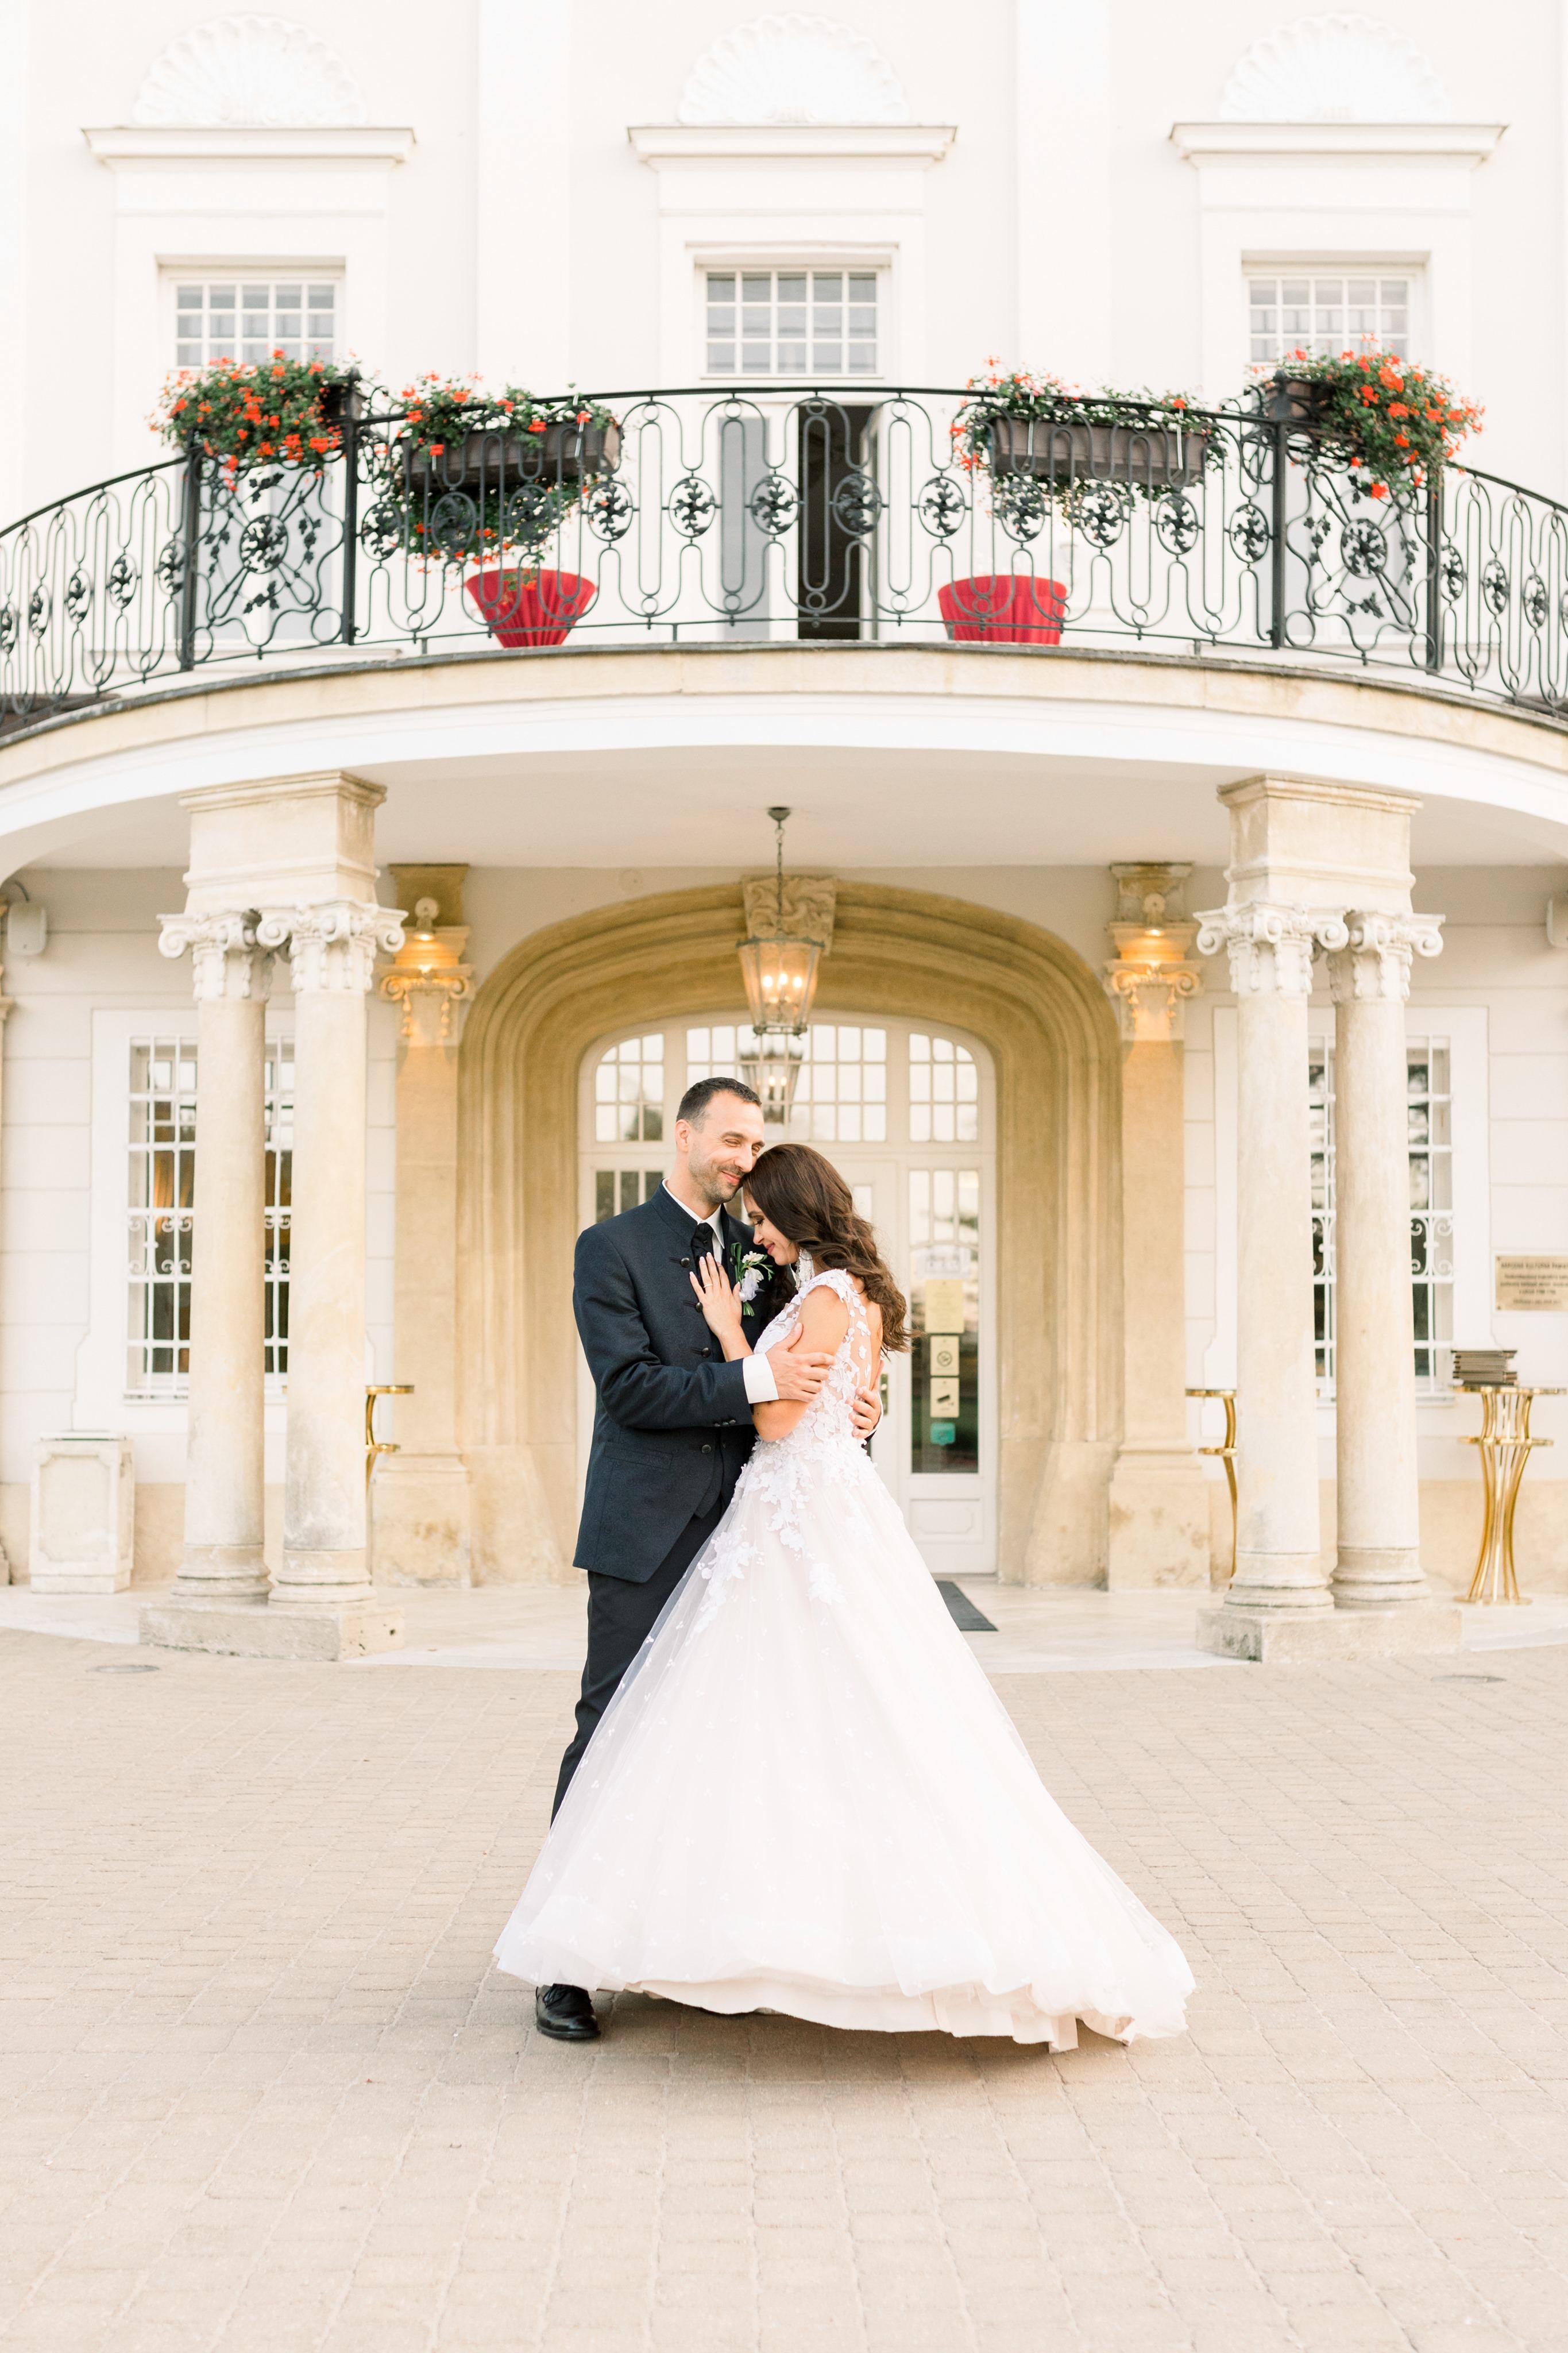 svadba-tomasov-cenajpg